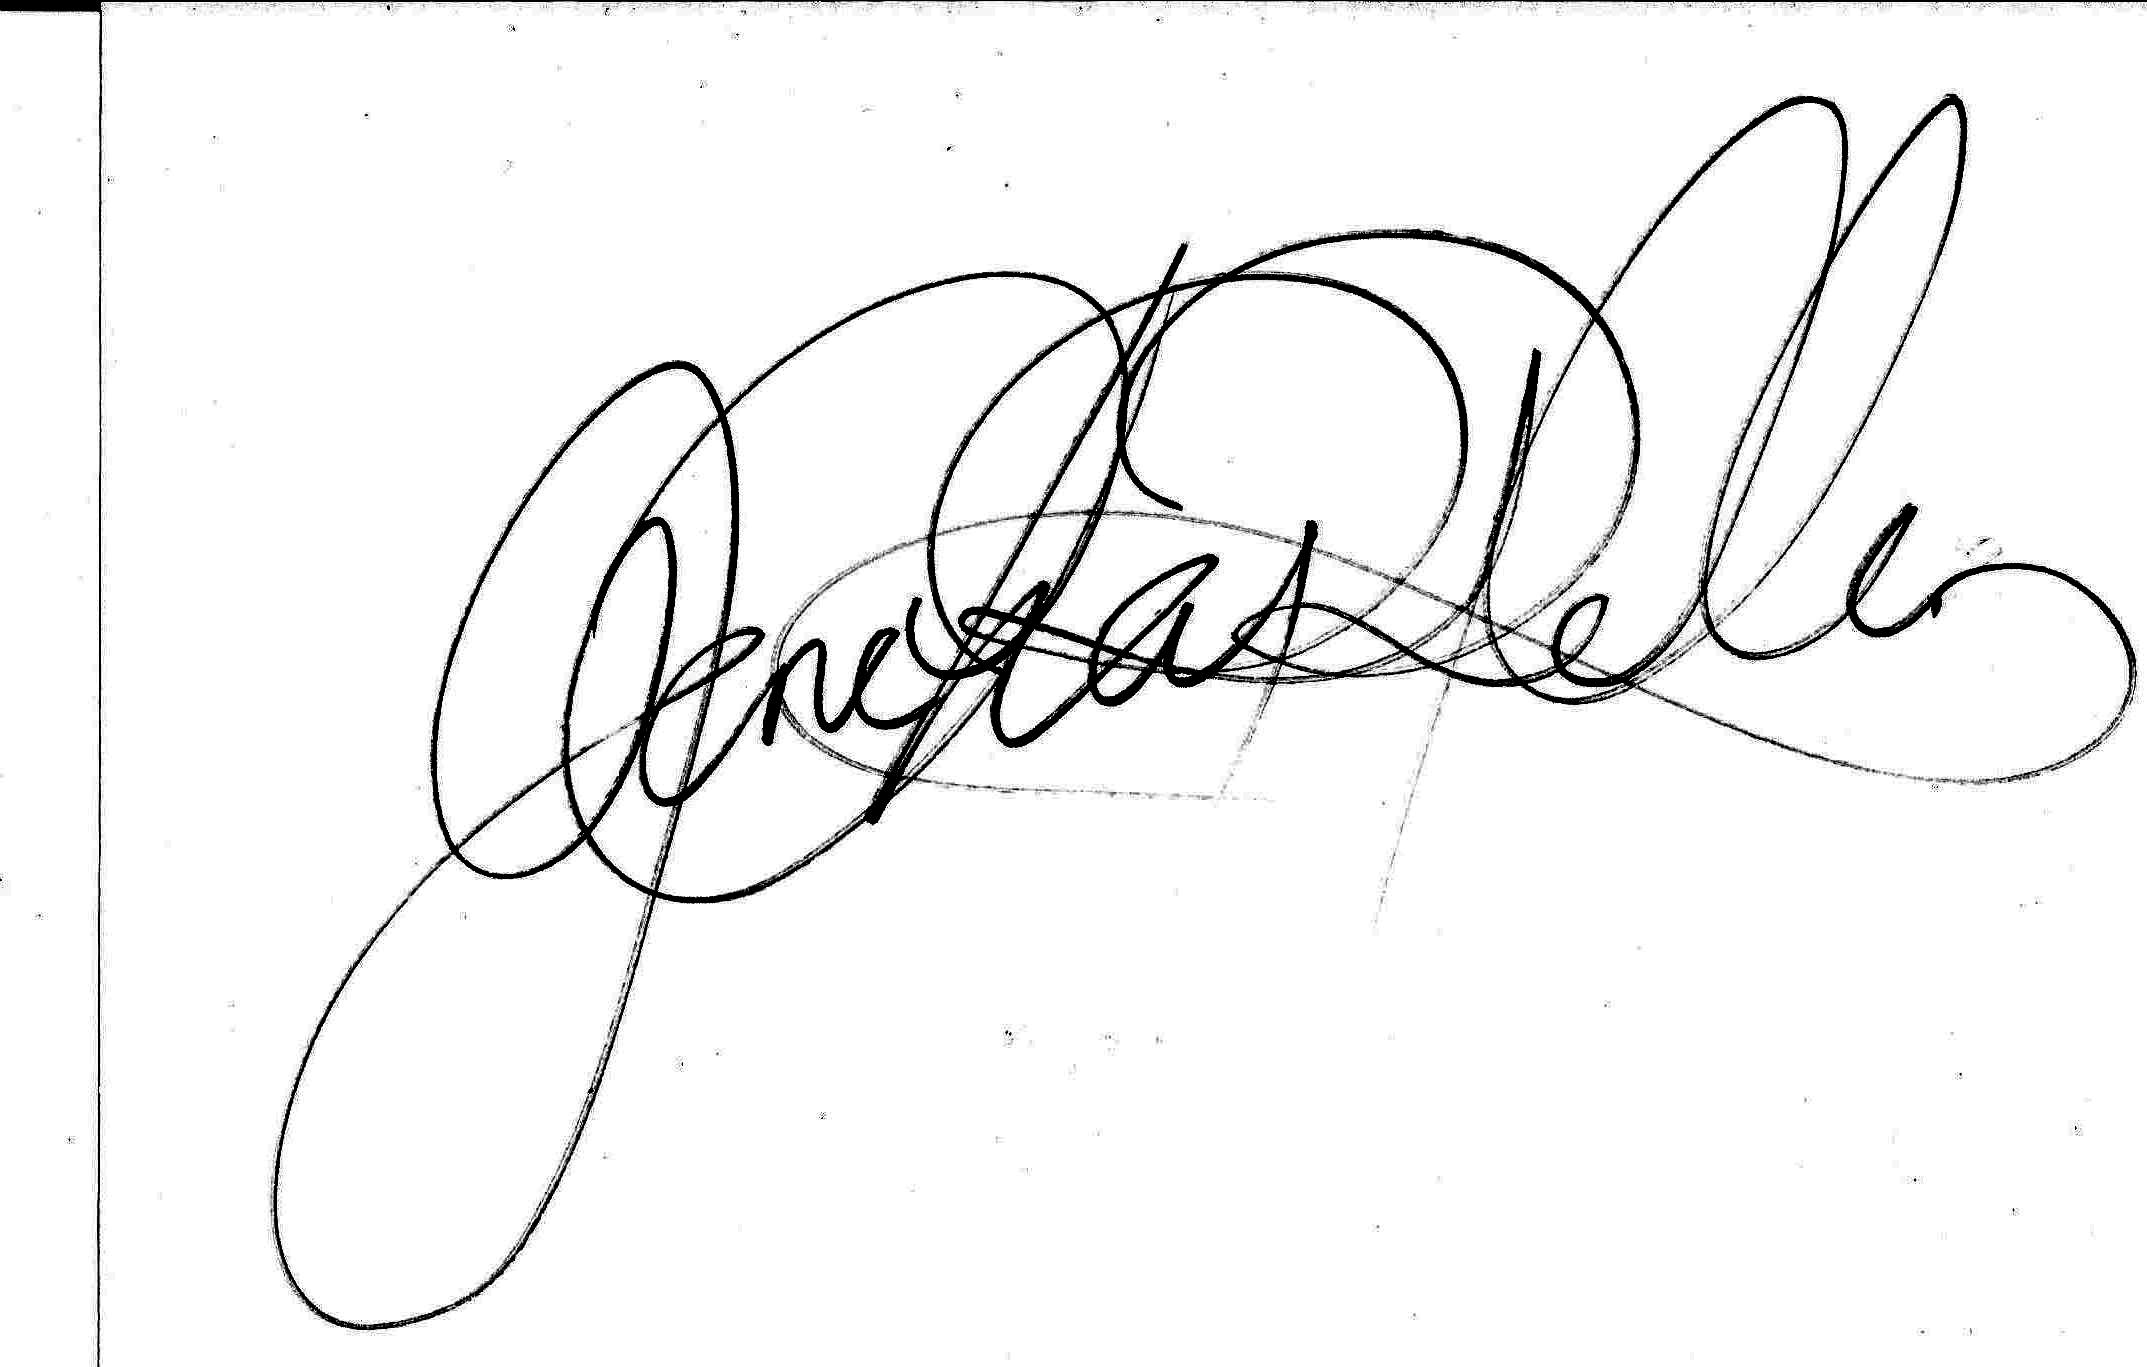 jane chappelle Signature